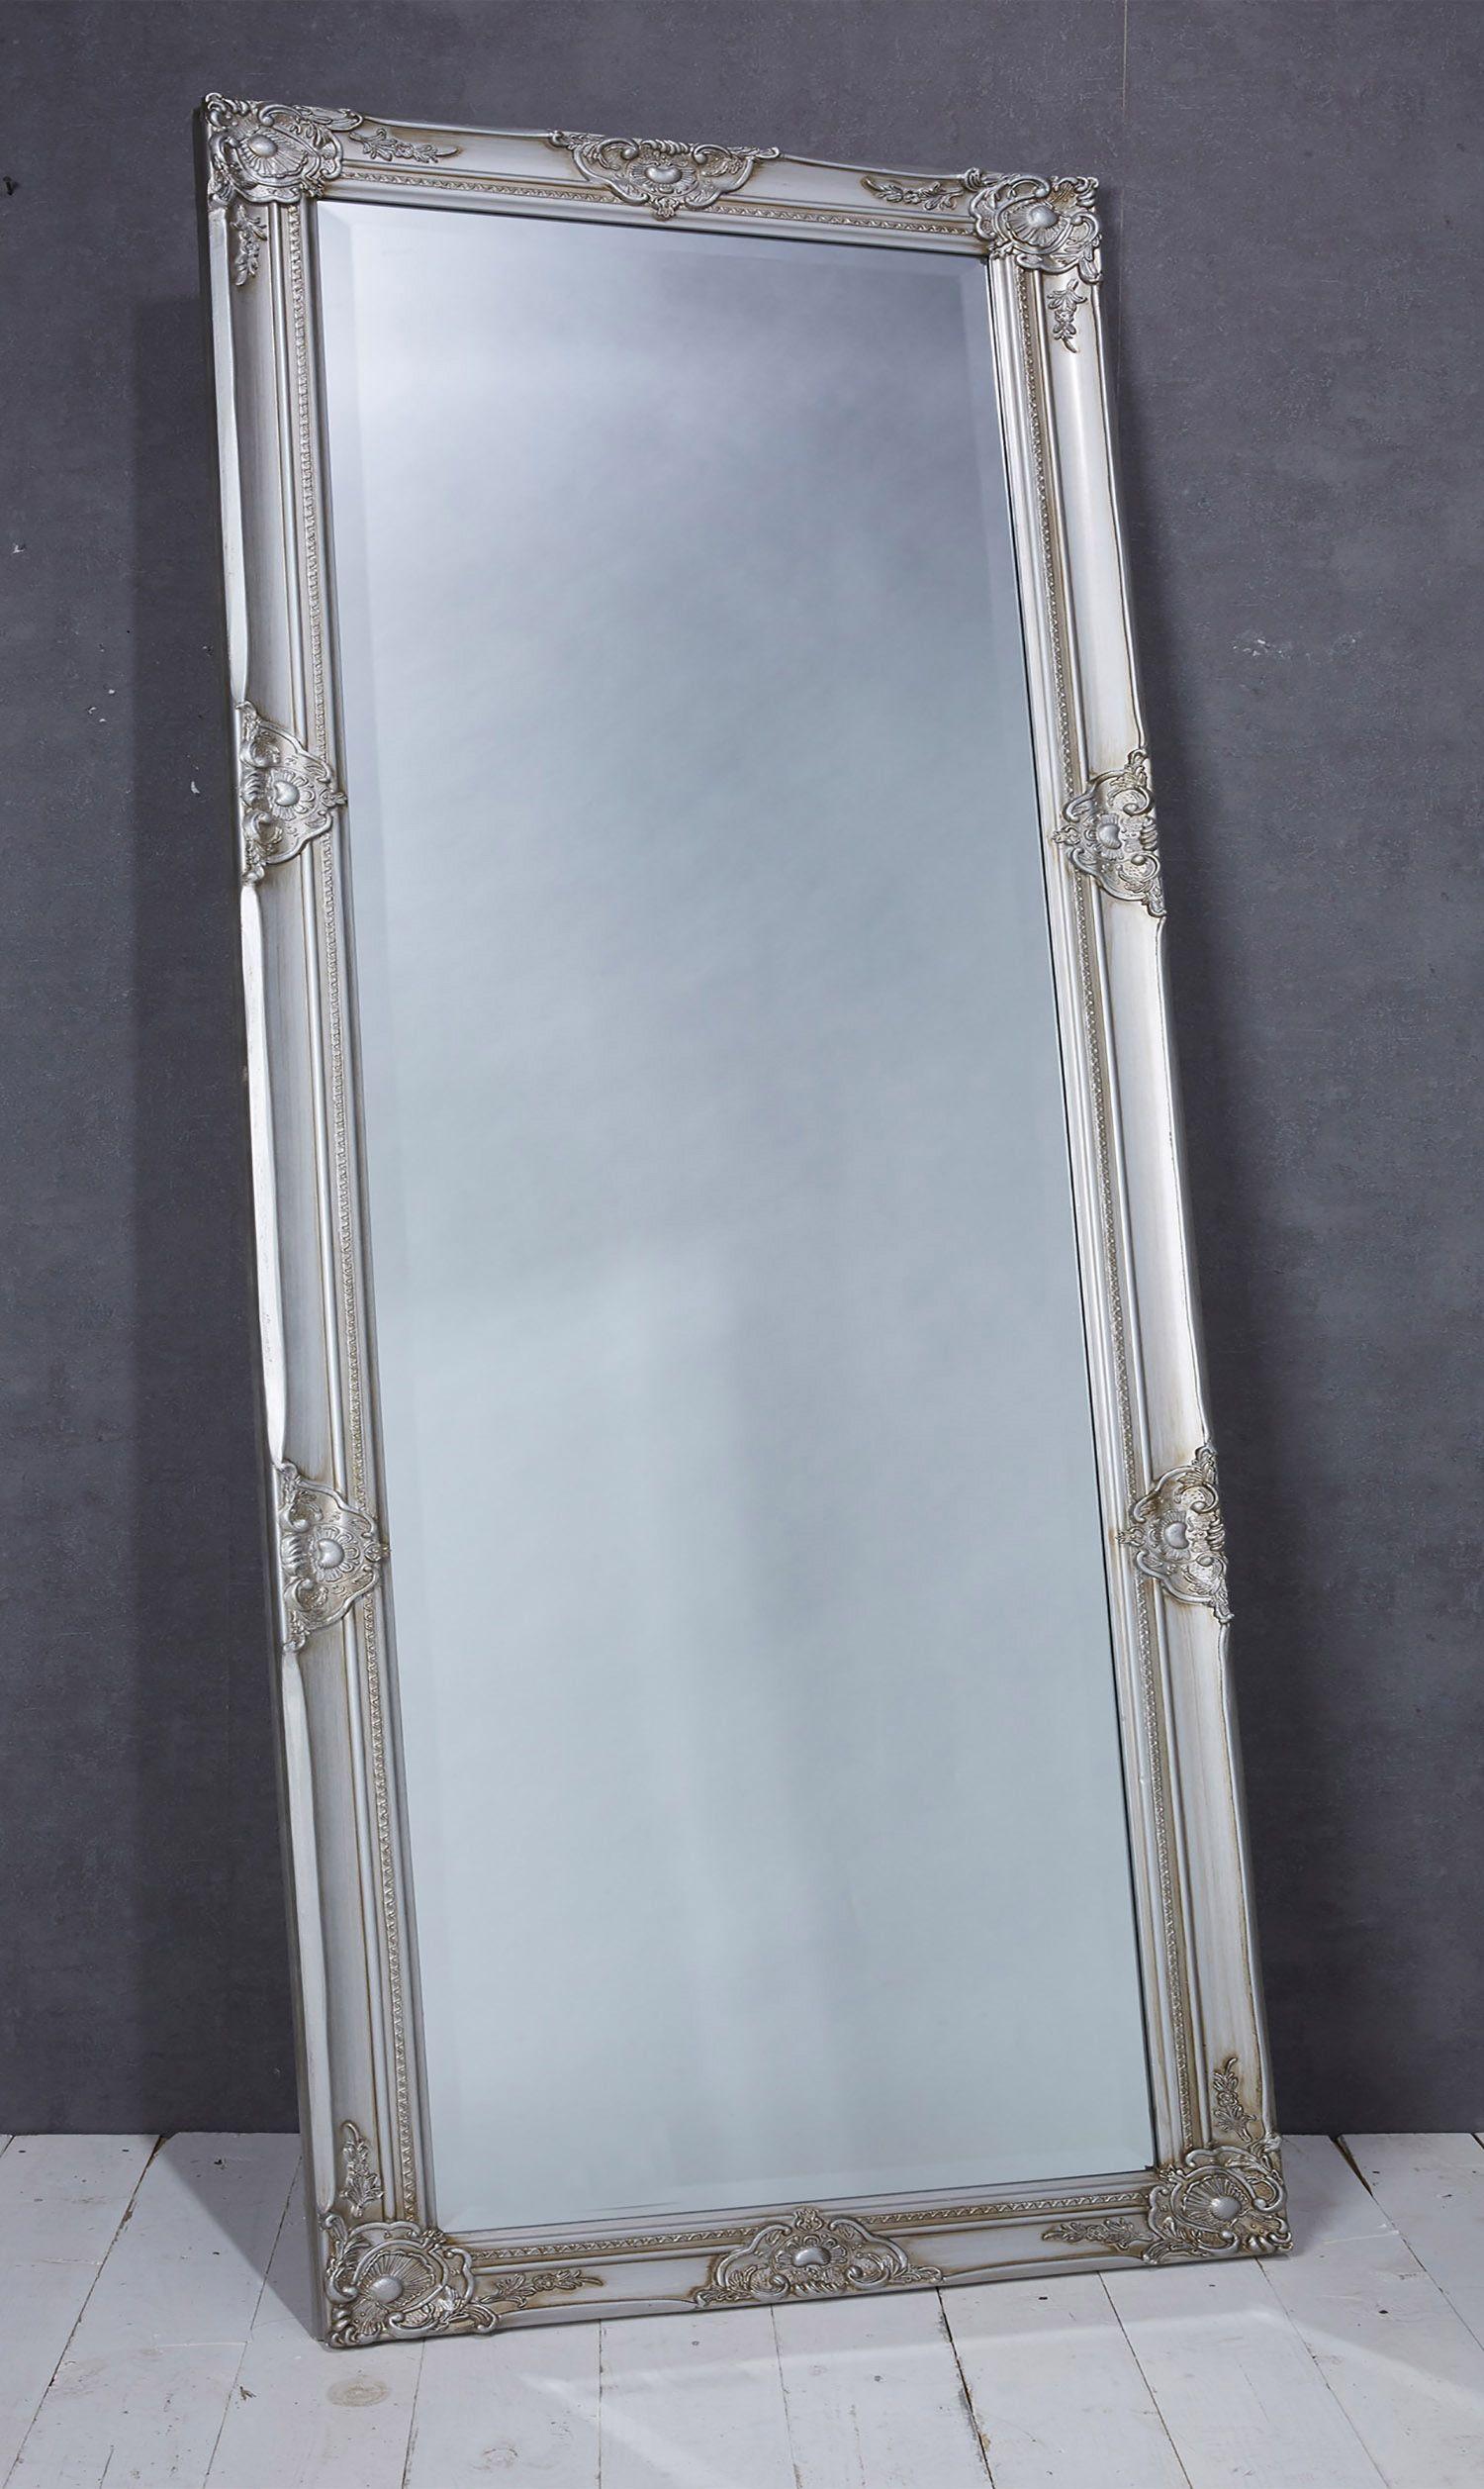 Wandspiegel Spiegel Silber Ca 180 X 80 Cm Antikstil